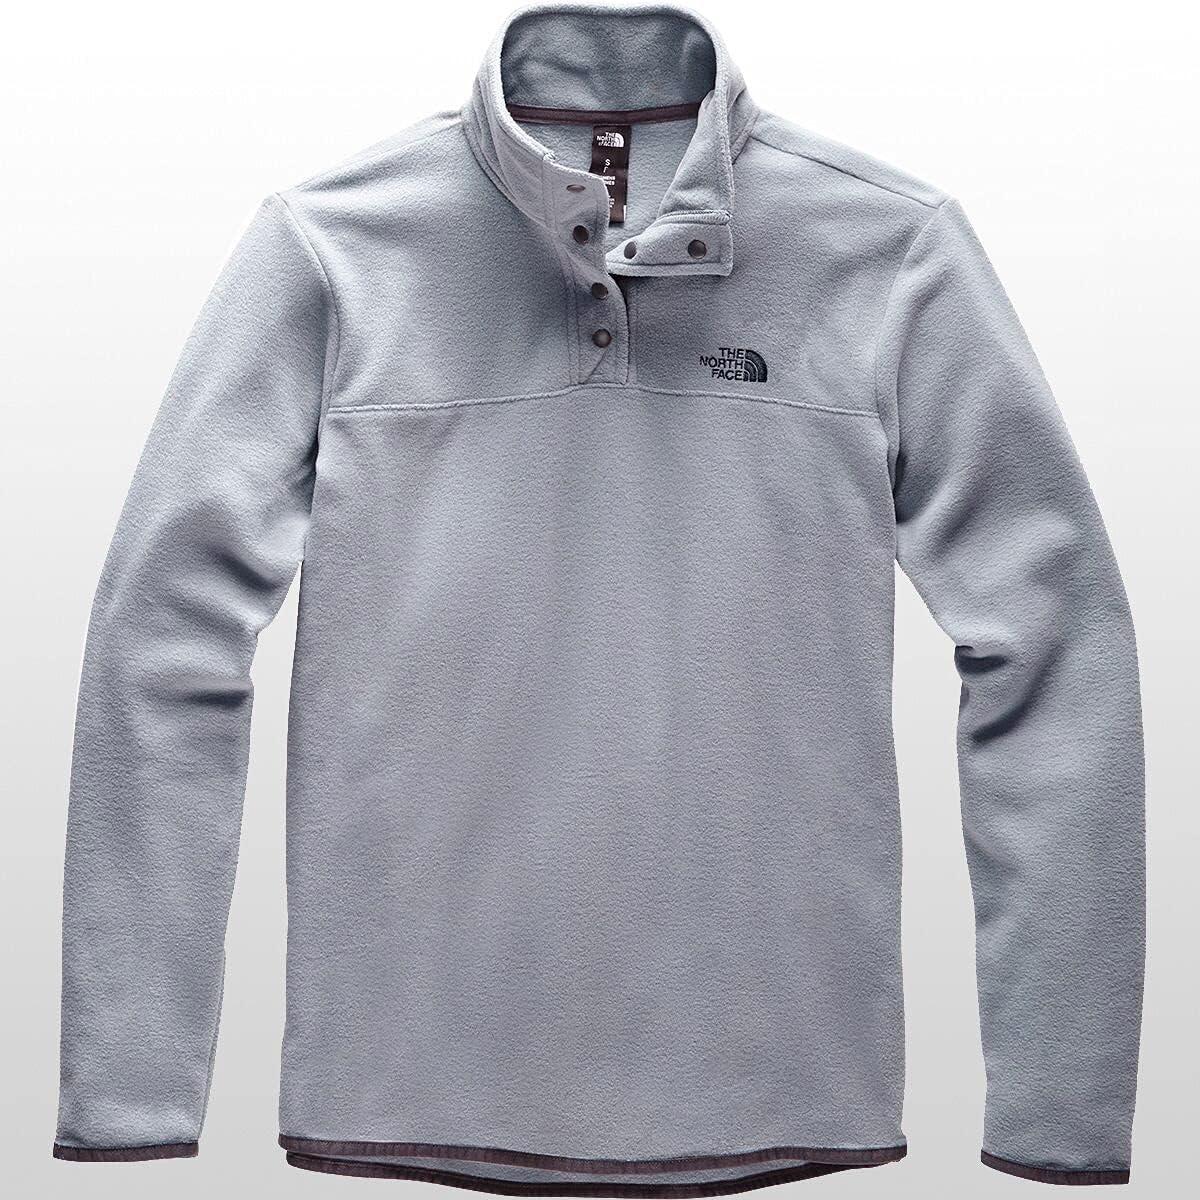 The North Face Women's TKA Glacier Snap-Neck Pullover Sweatshirt